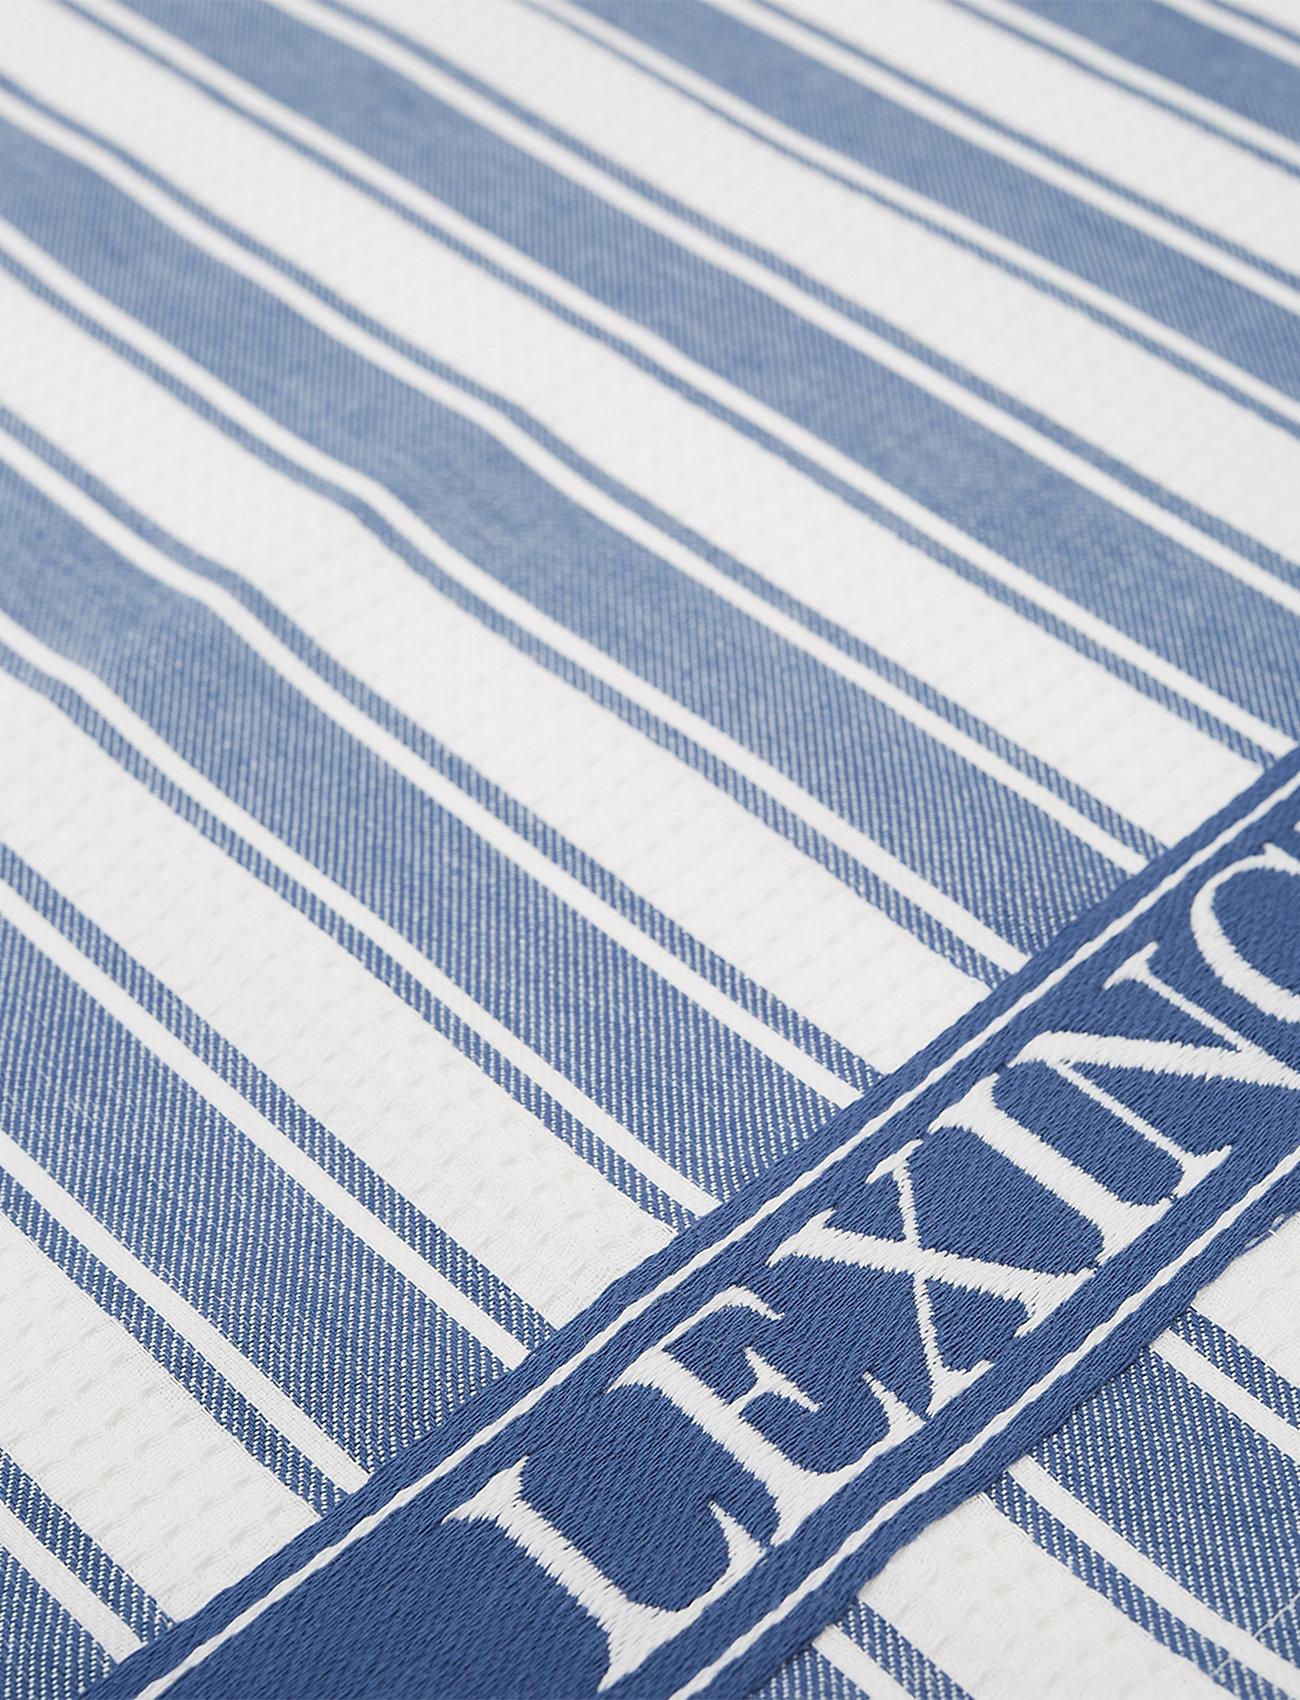 Lexington Home - Icons Cotton Twill Waffle Striped Kitchen Towel - ręczniki kuchenne - blue/white - 1